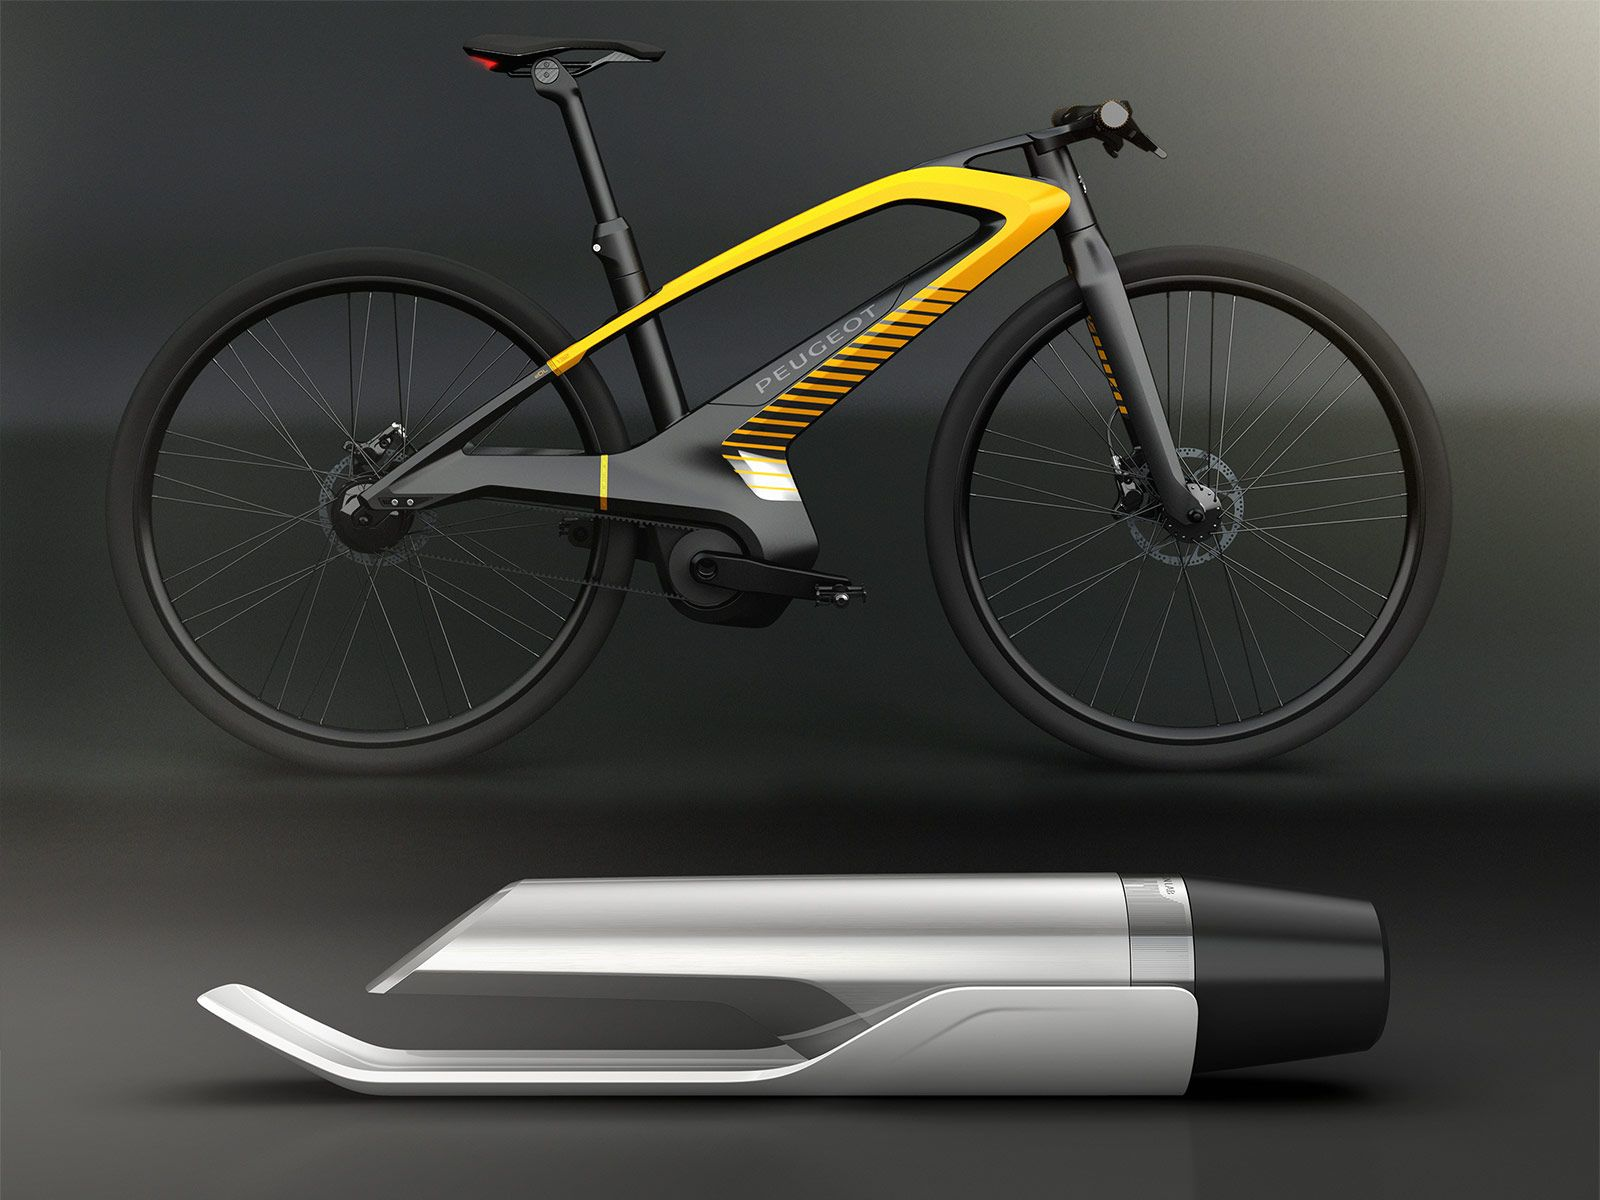 Peugeot Design Lab At Paris 2012 Fiets Ontwerp Fiets Fietsen